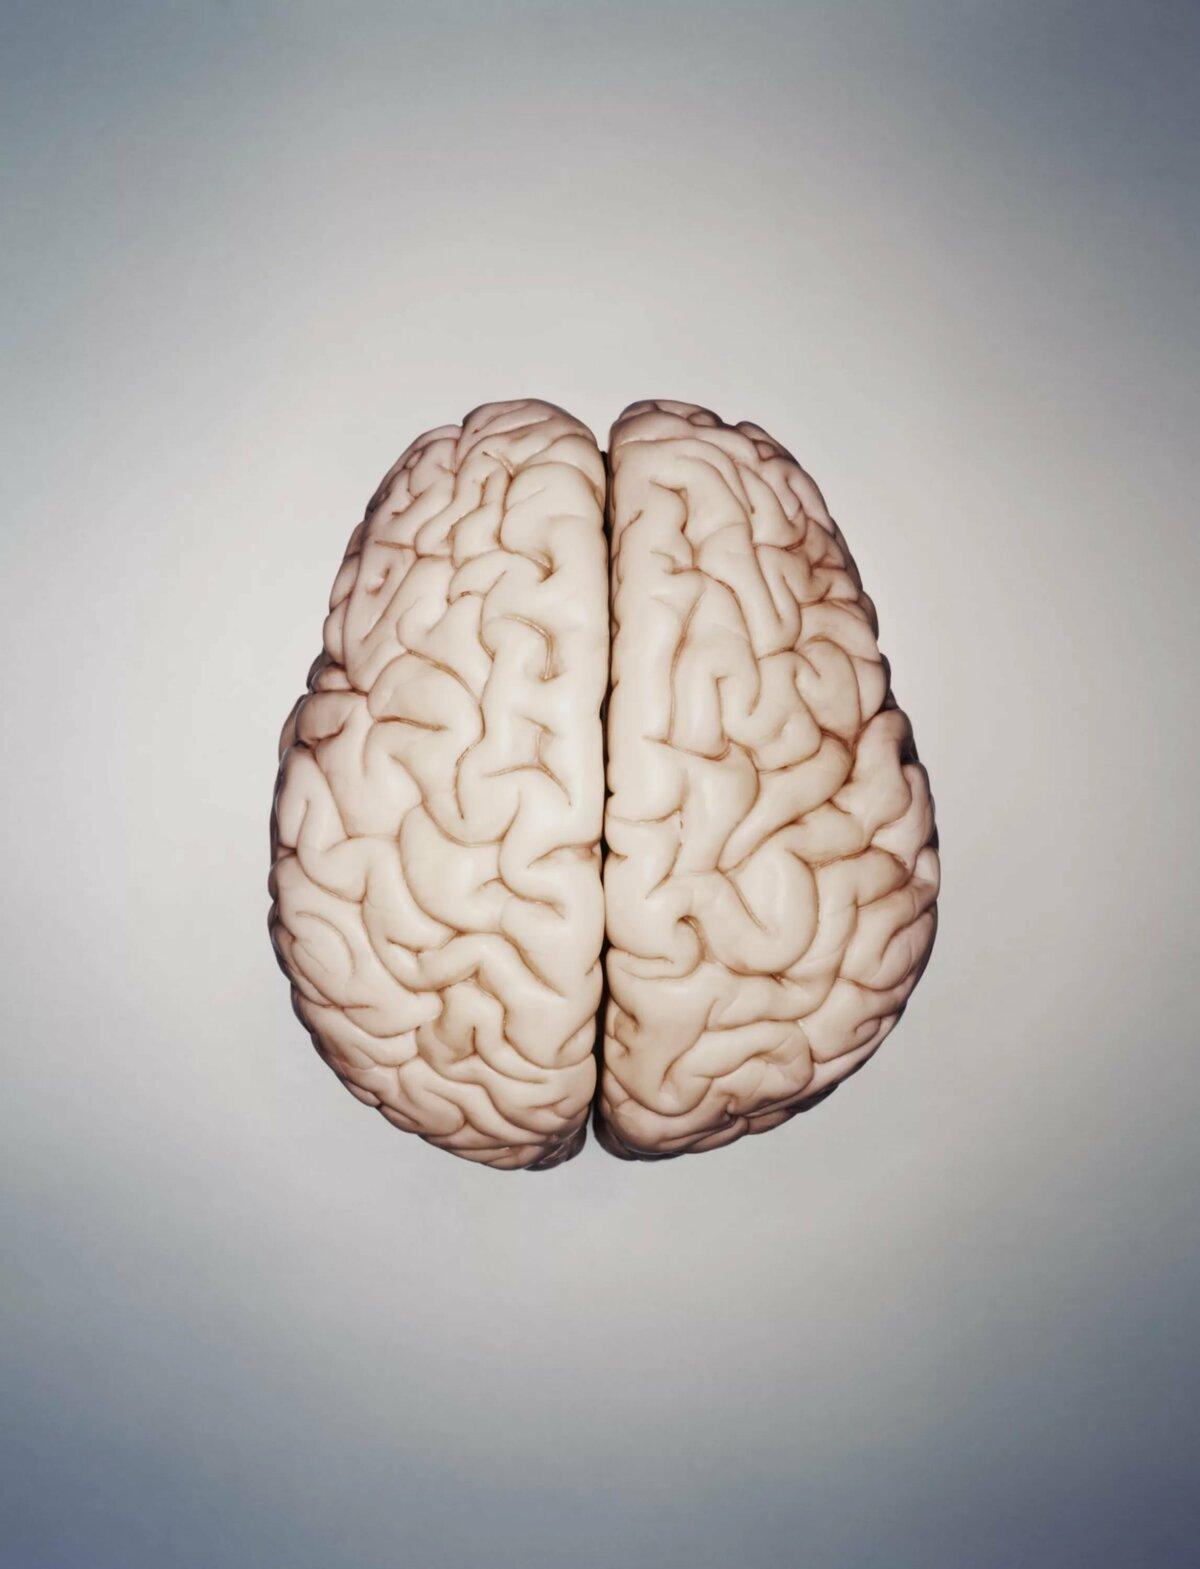 проверка мозга с картинками тем